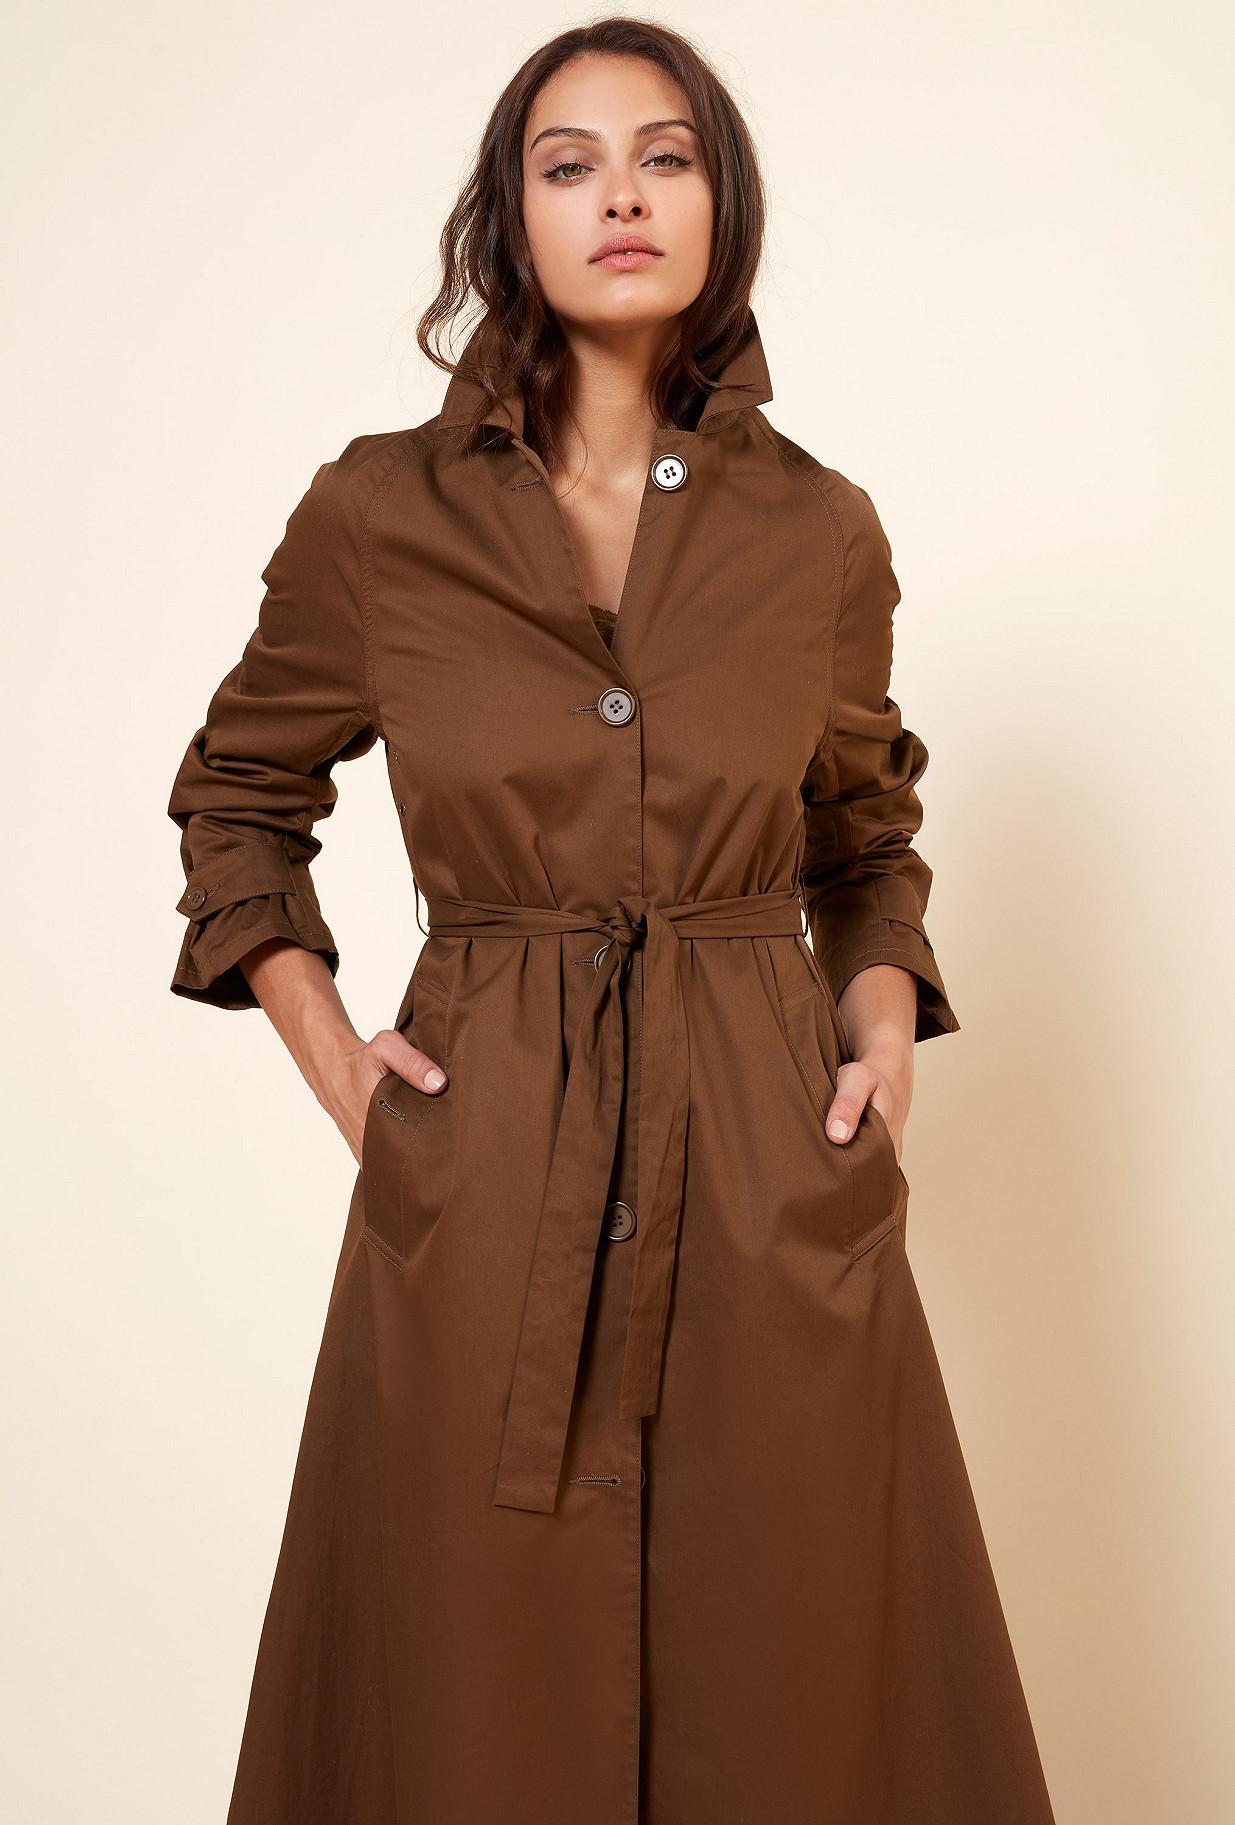 Paris clothes store COAT  Grant french designer fashion Paris